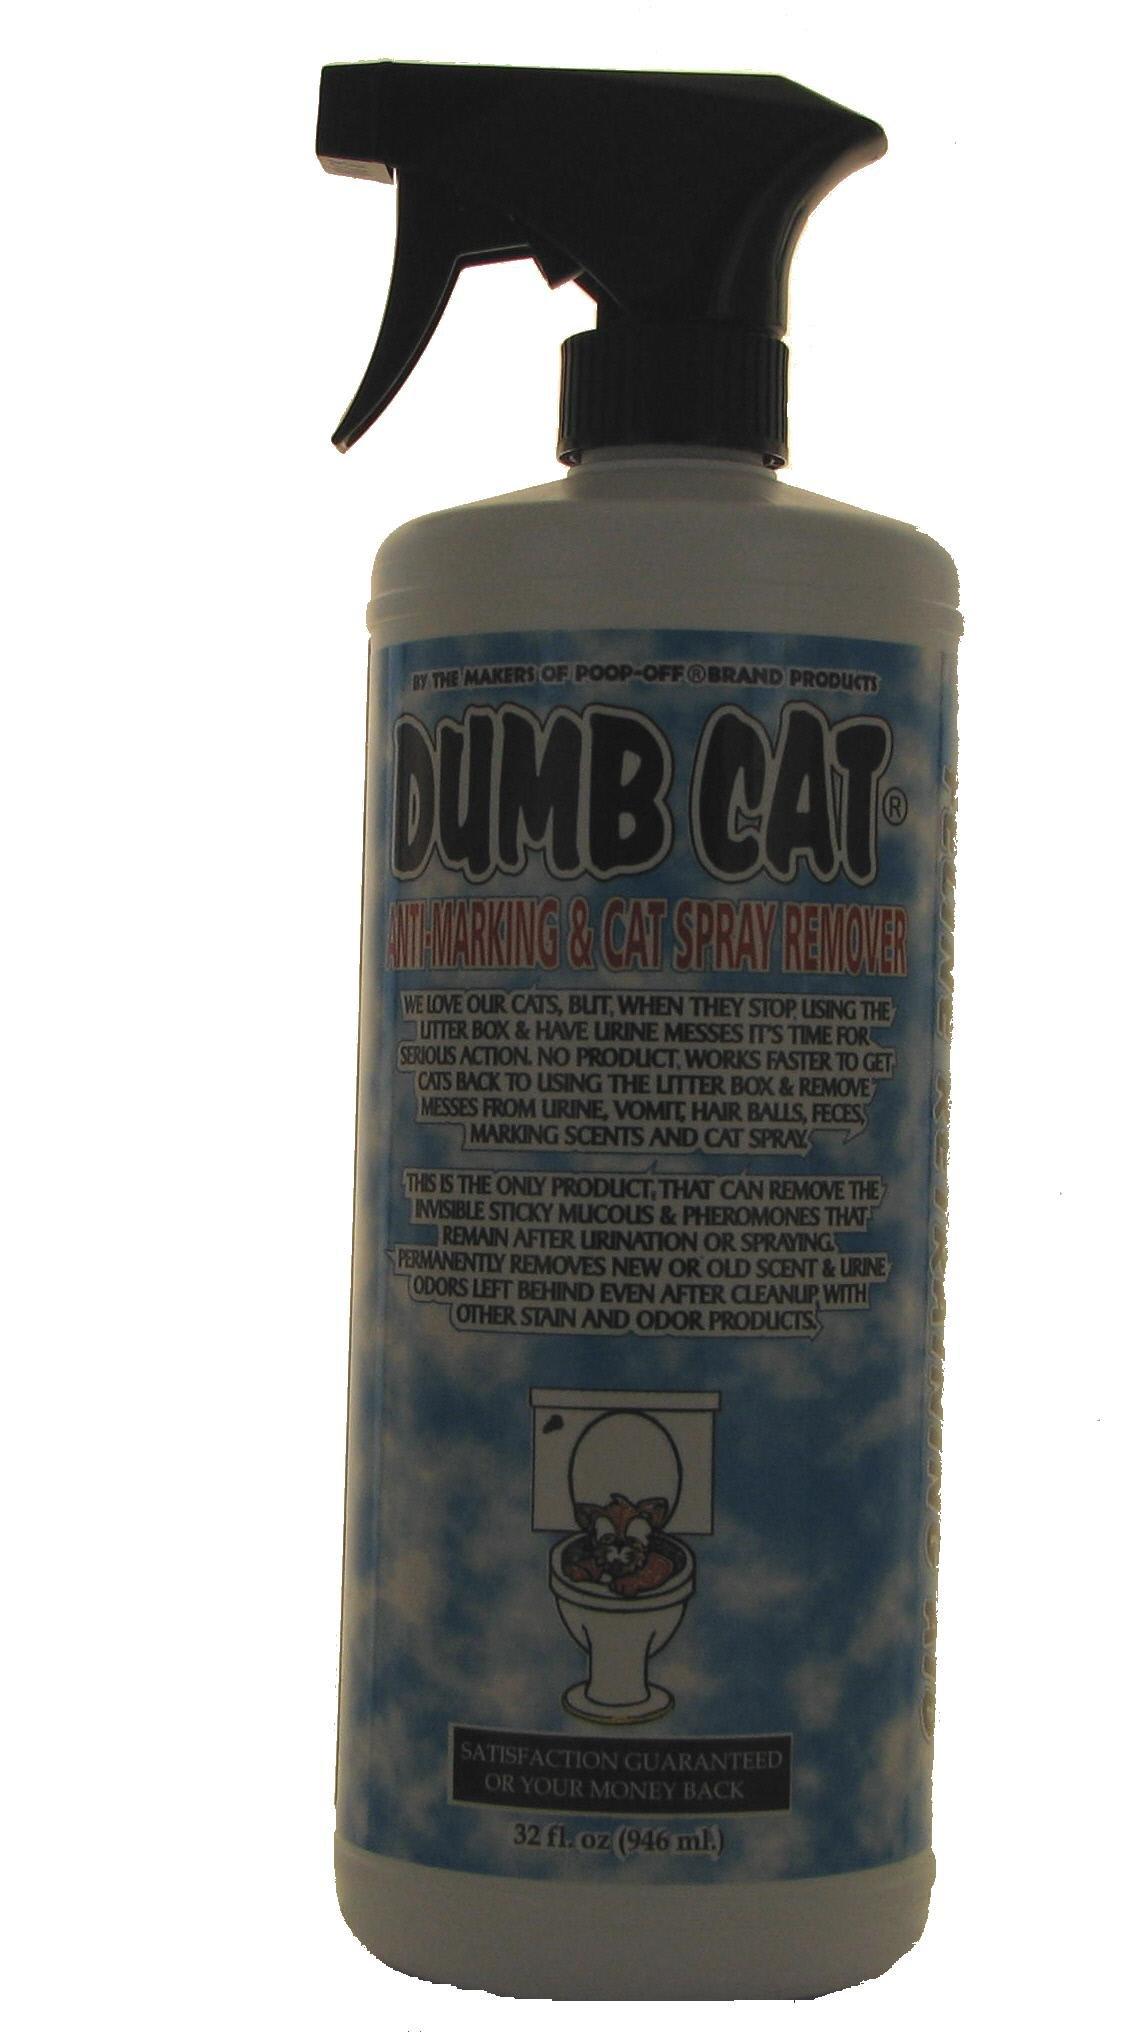 Dumb Cat Anti-Marking and Cat Spray Remover Feline Retraining Aid Sprayer, 32-Ounce by Dumb Cat